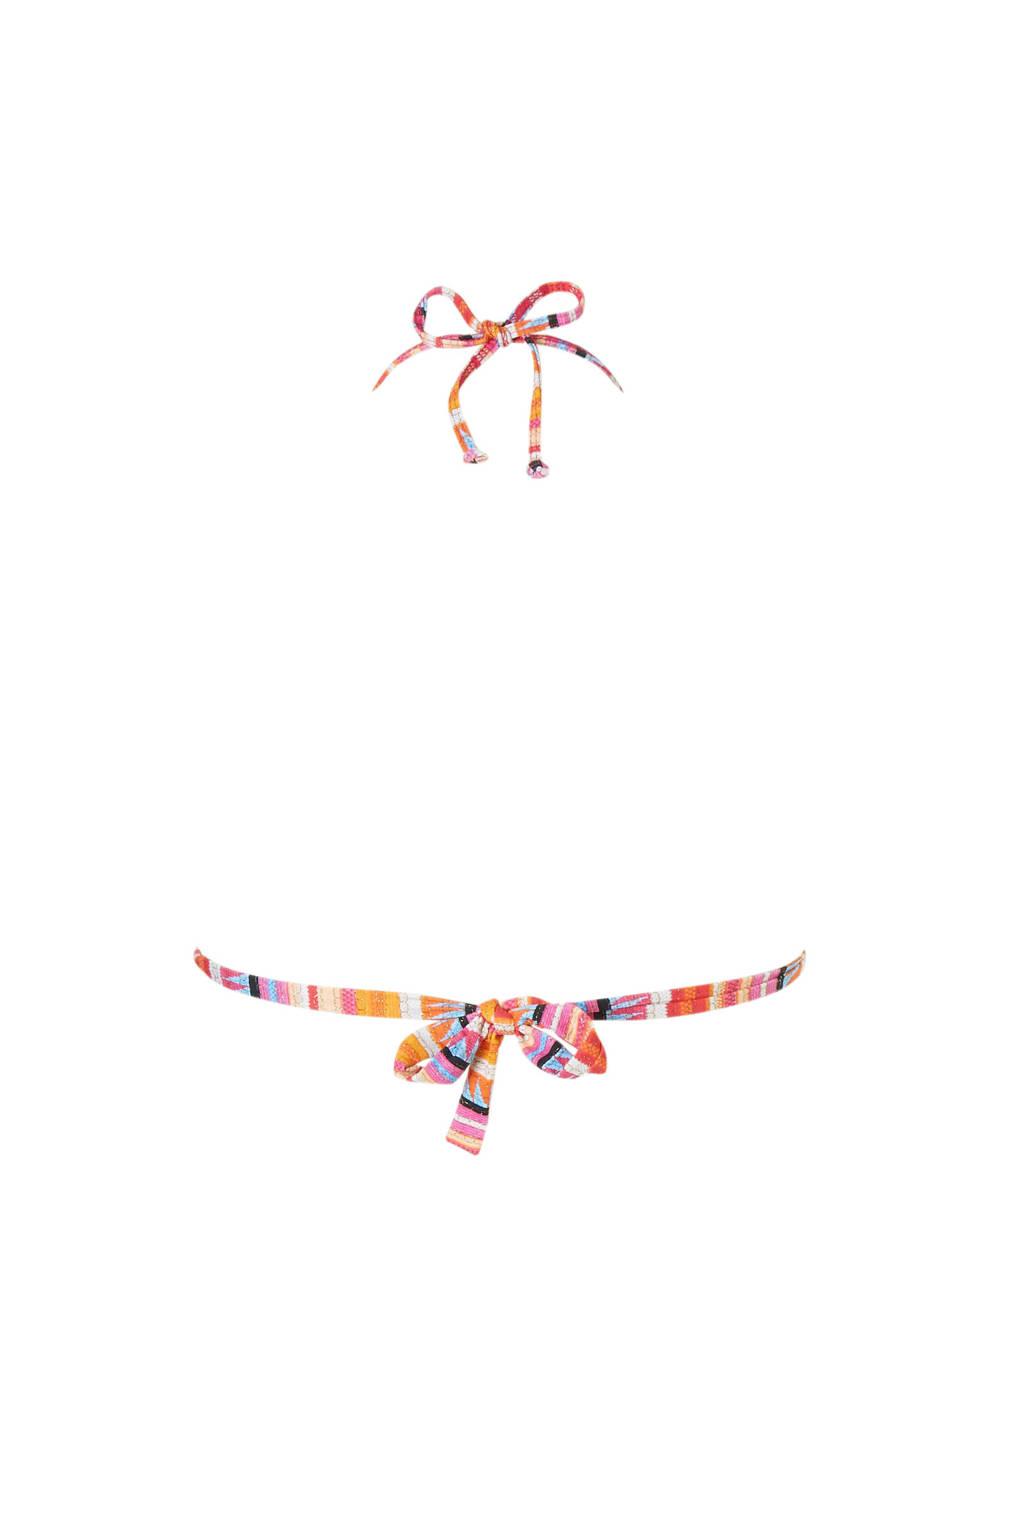 Moontriangel Over Banana Bikinitop Print Oranje In All dv0qP0xI